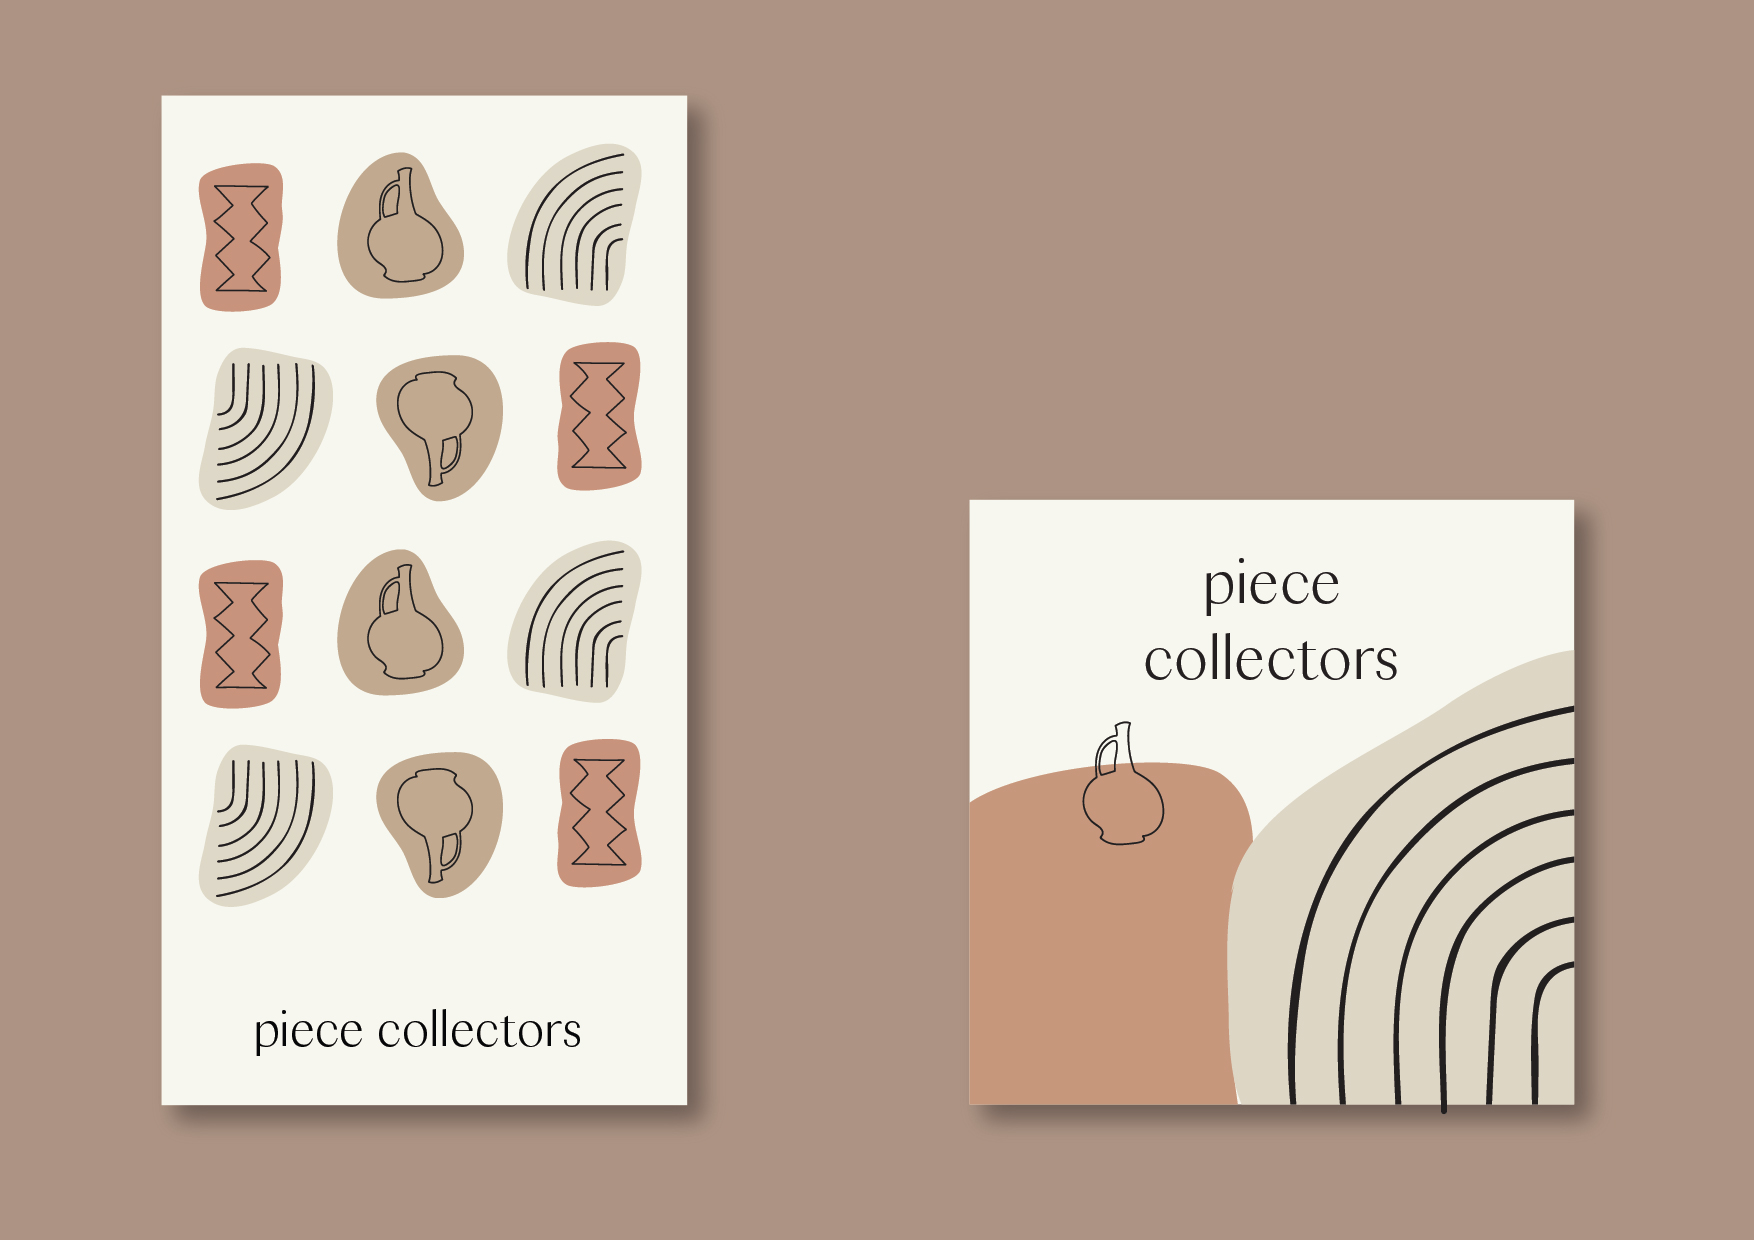 Piece Collectors Brand Identity